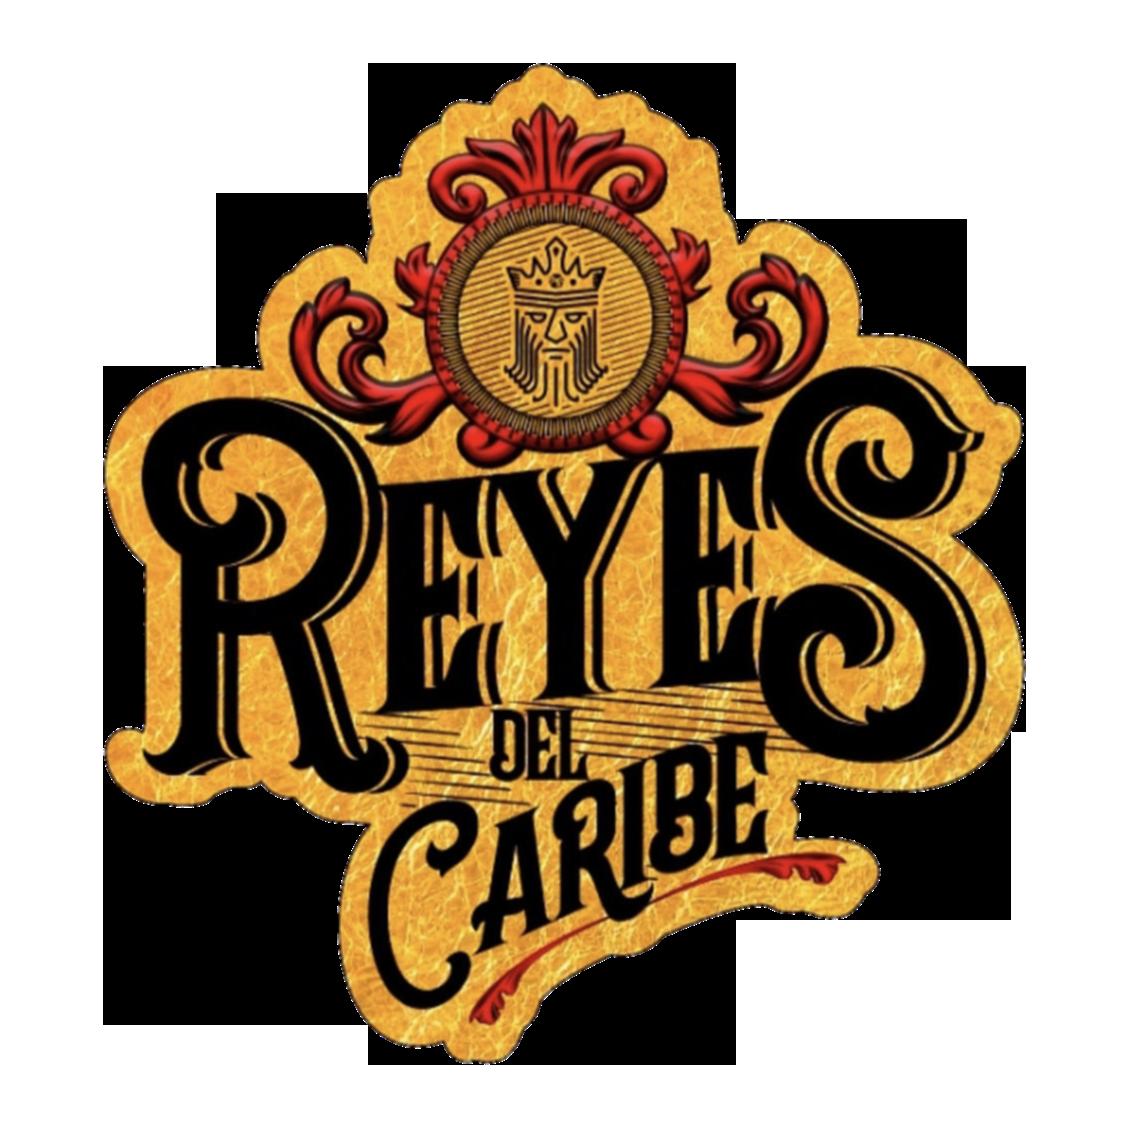 Reyes Del Caribe Cigars